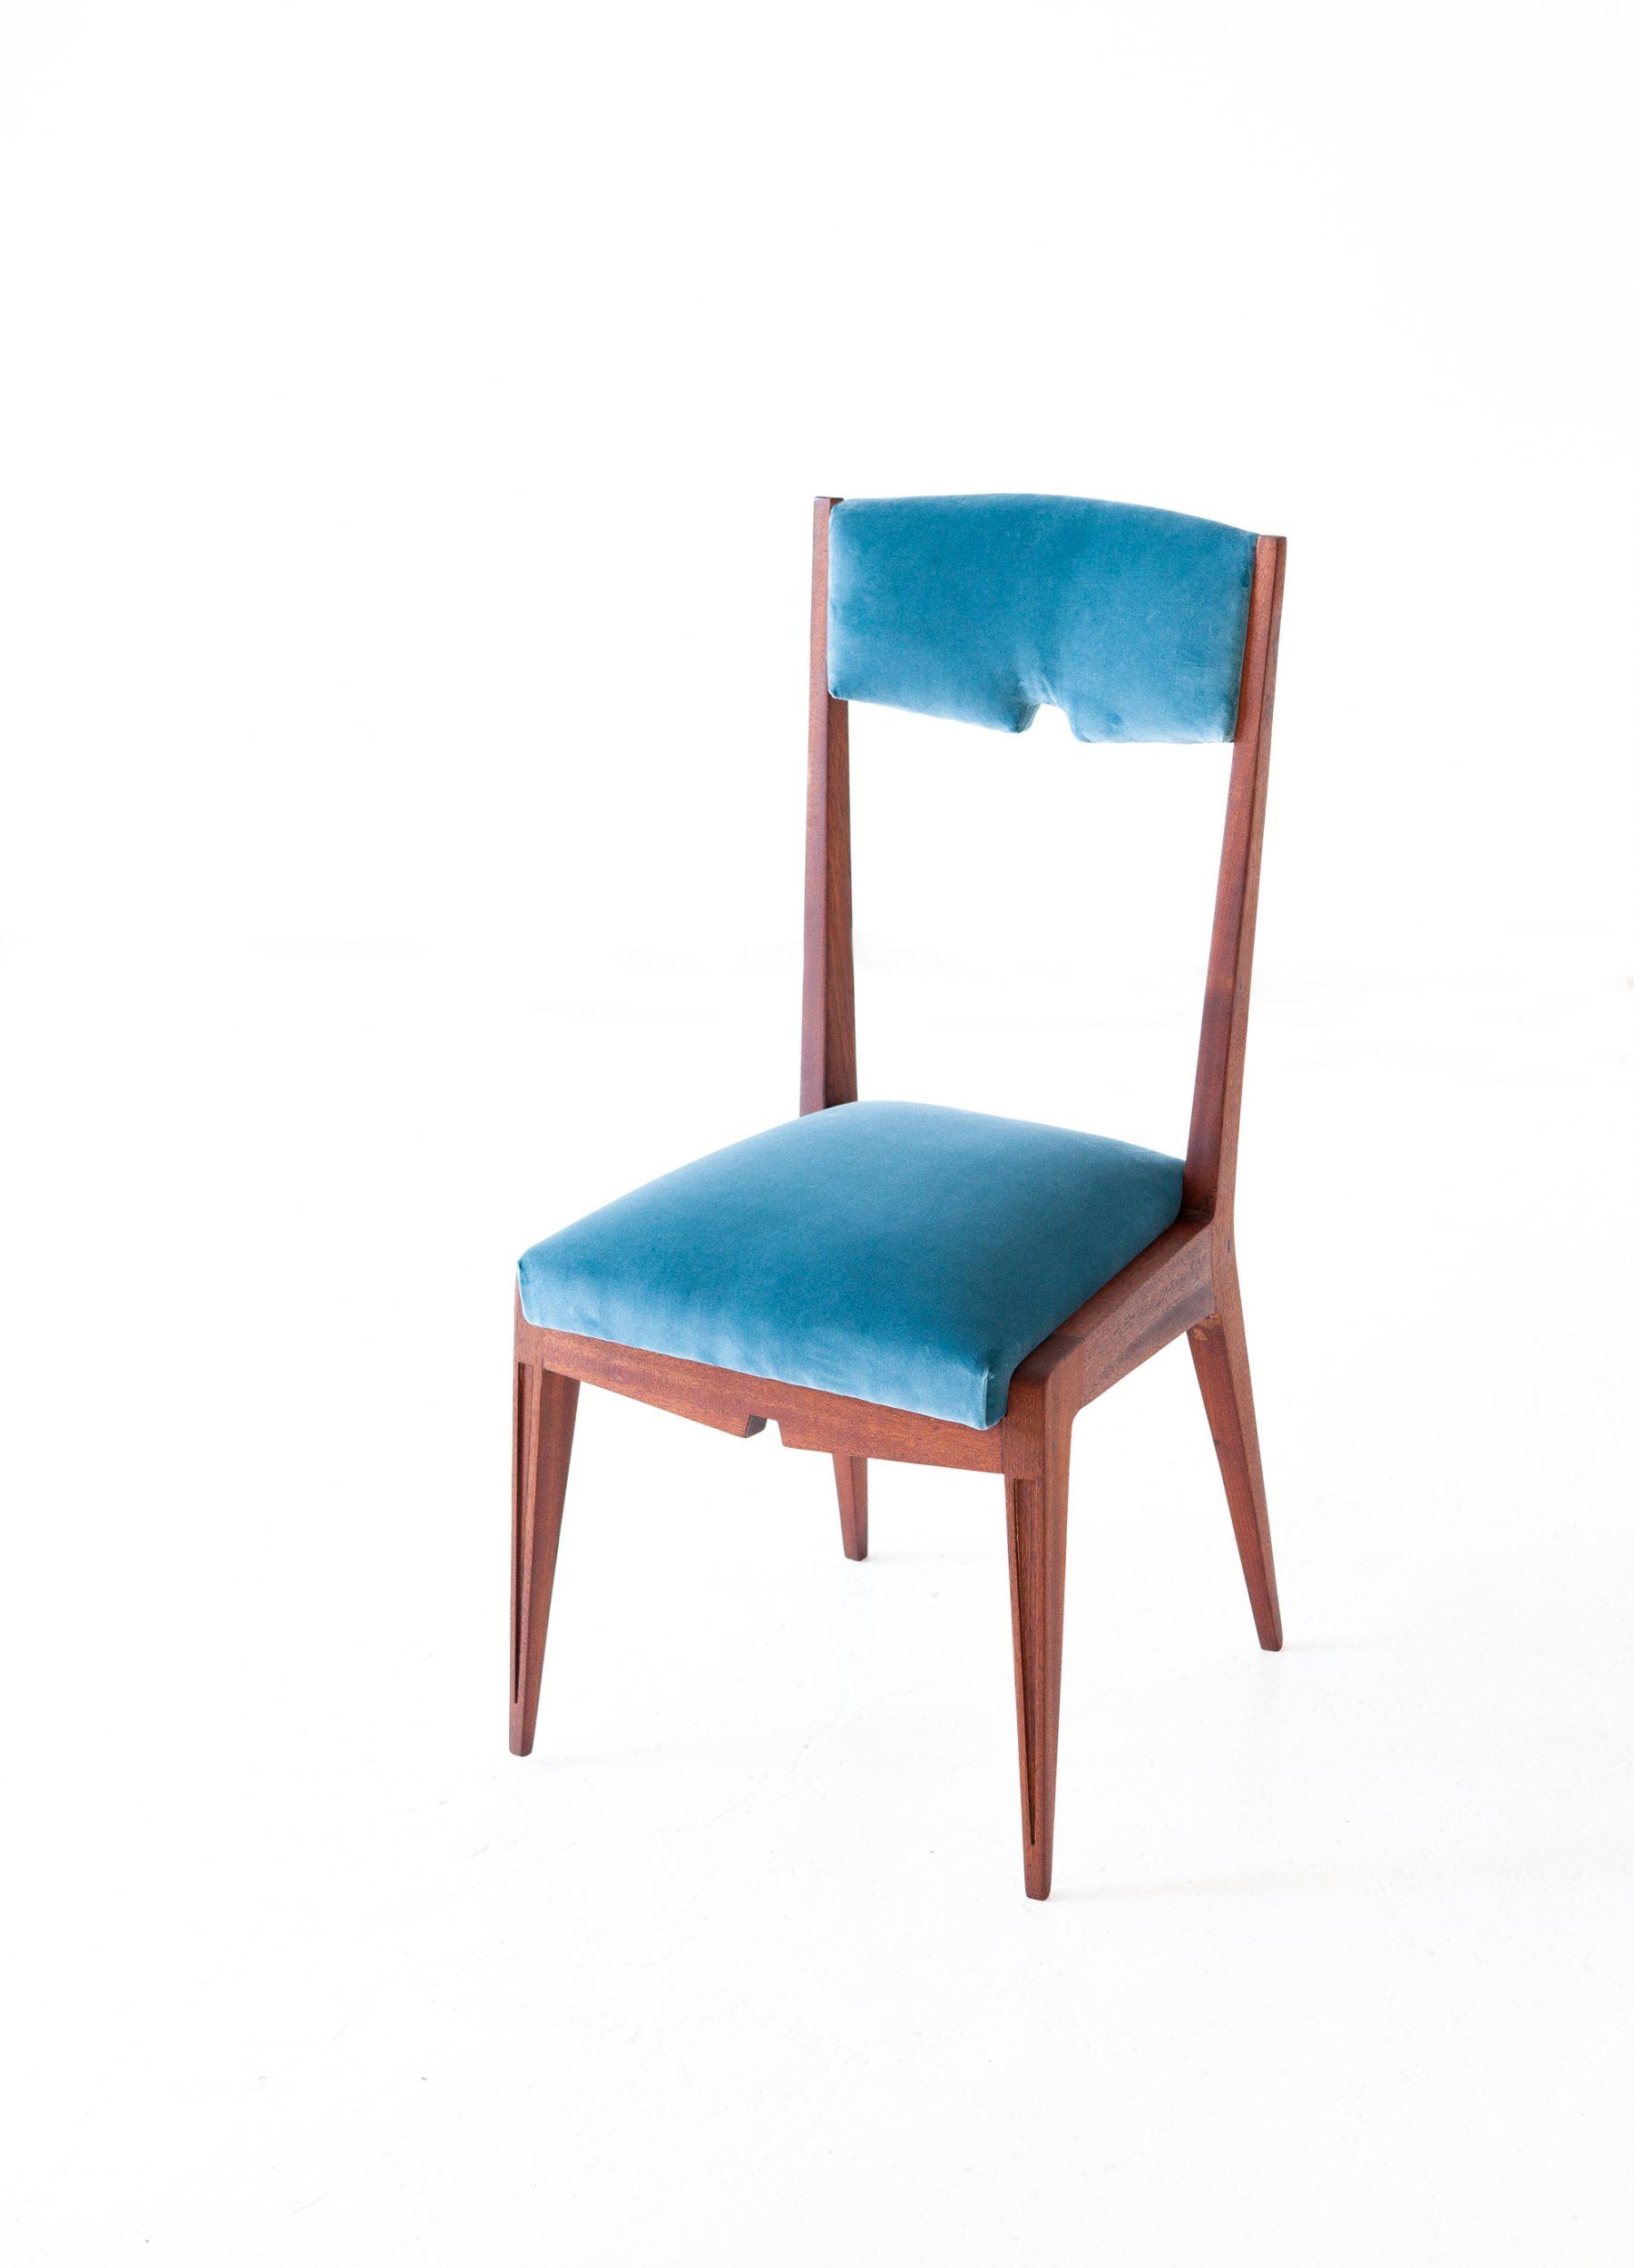 six-light-blue-velvet-mahogany-chairs.3